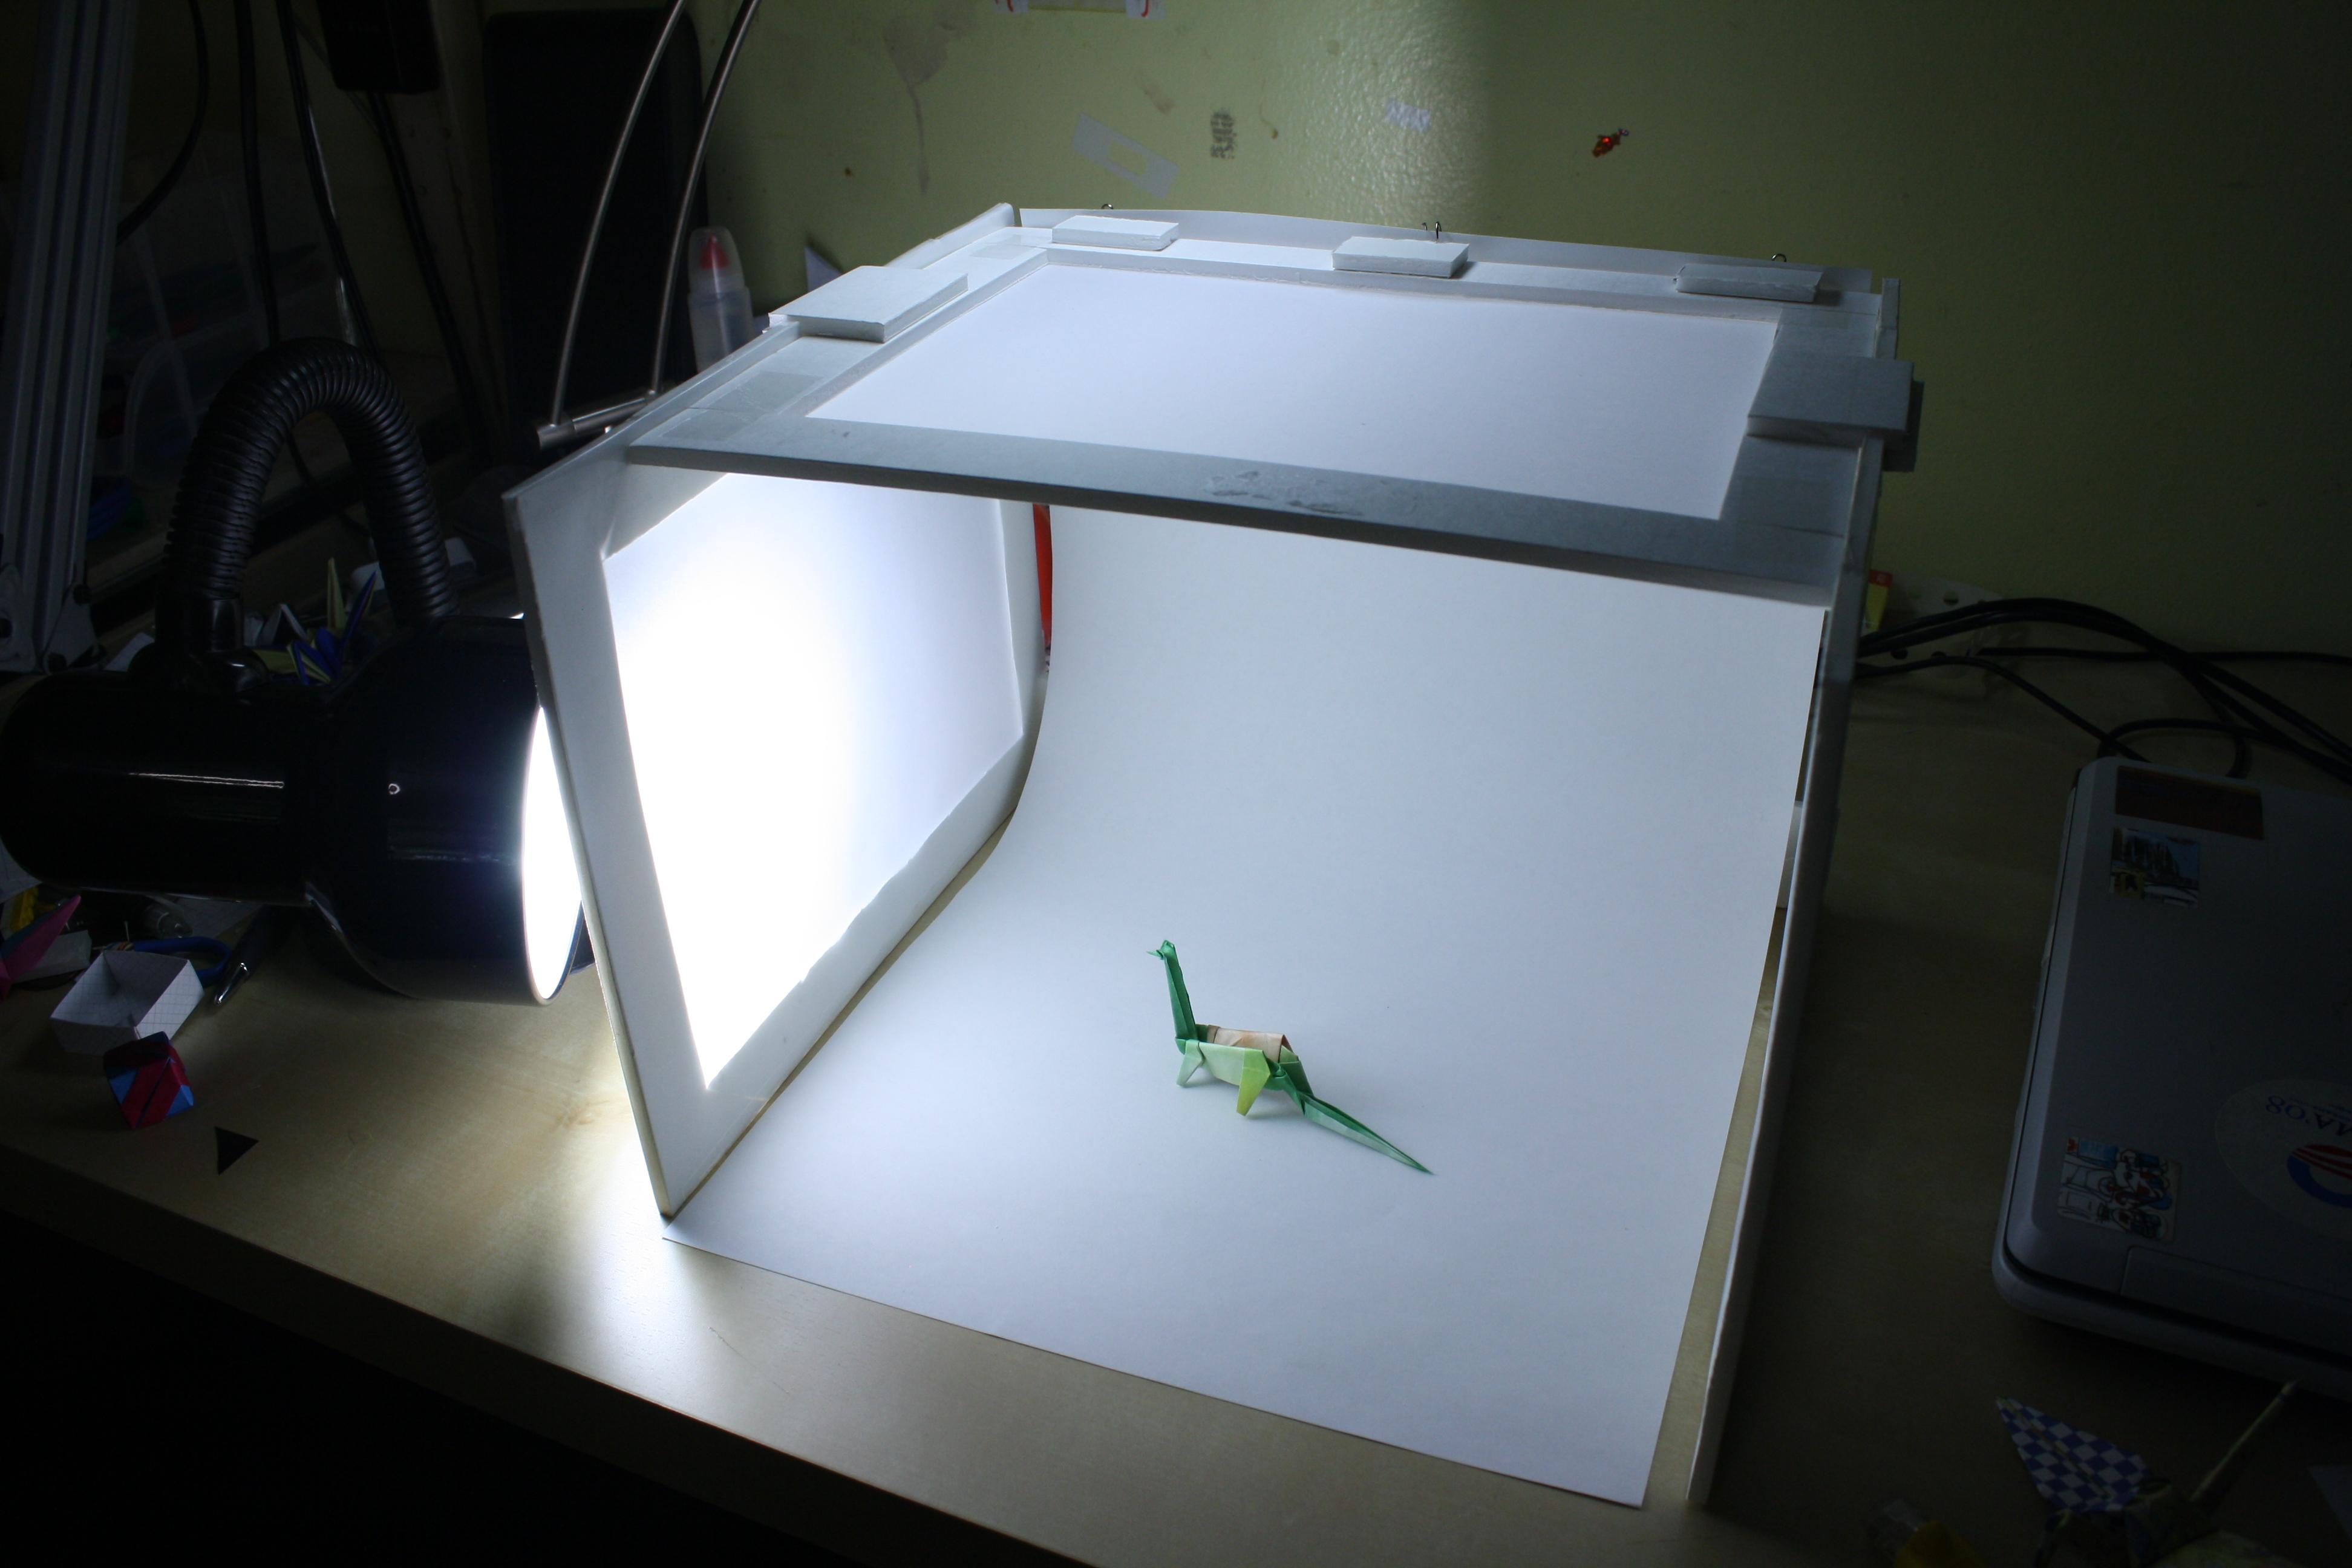 lighttent photography codenamepending